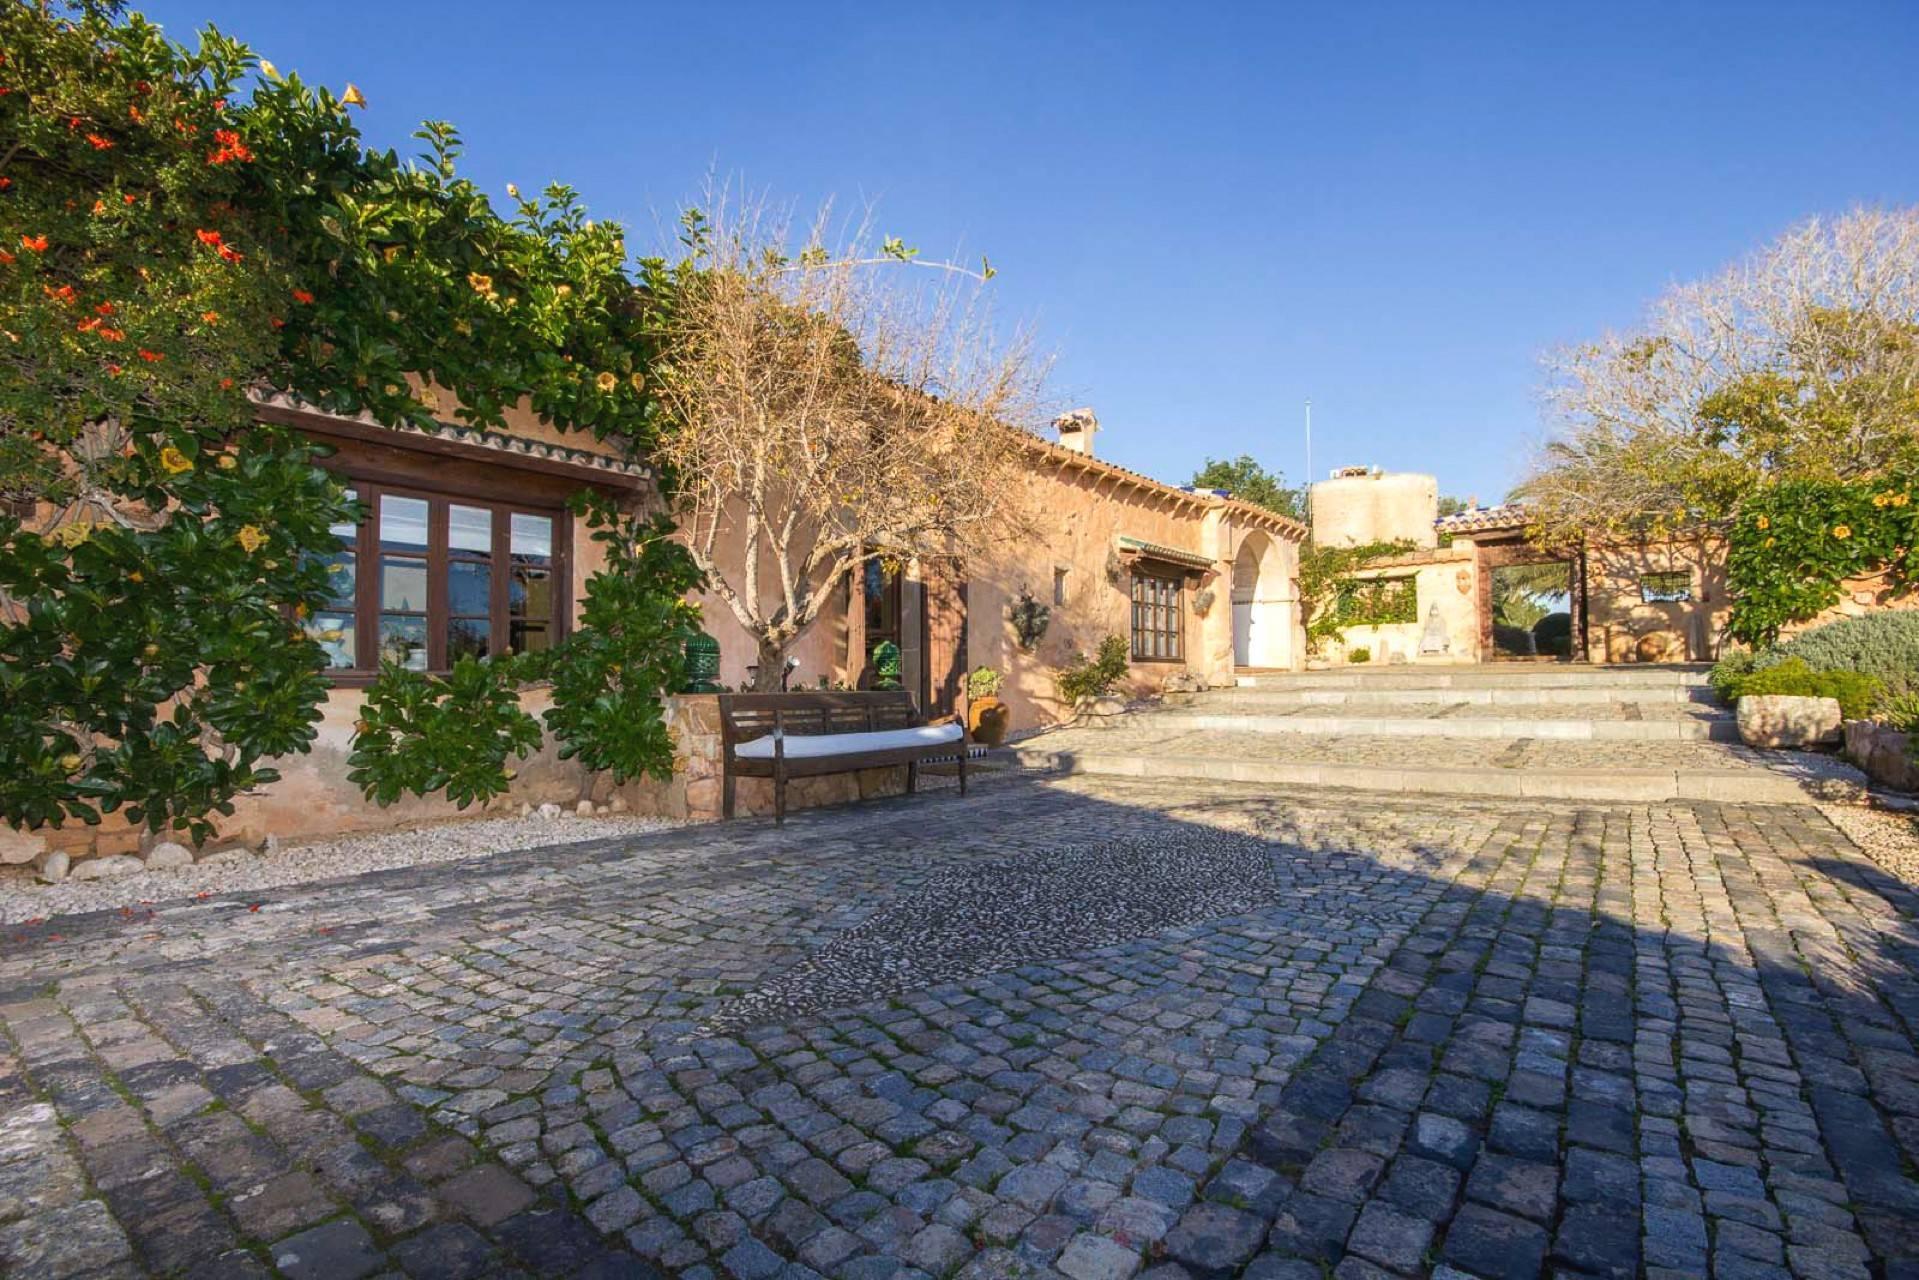 01-116 extravagante luxus Finca Mallorca Süden Bild 11